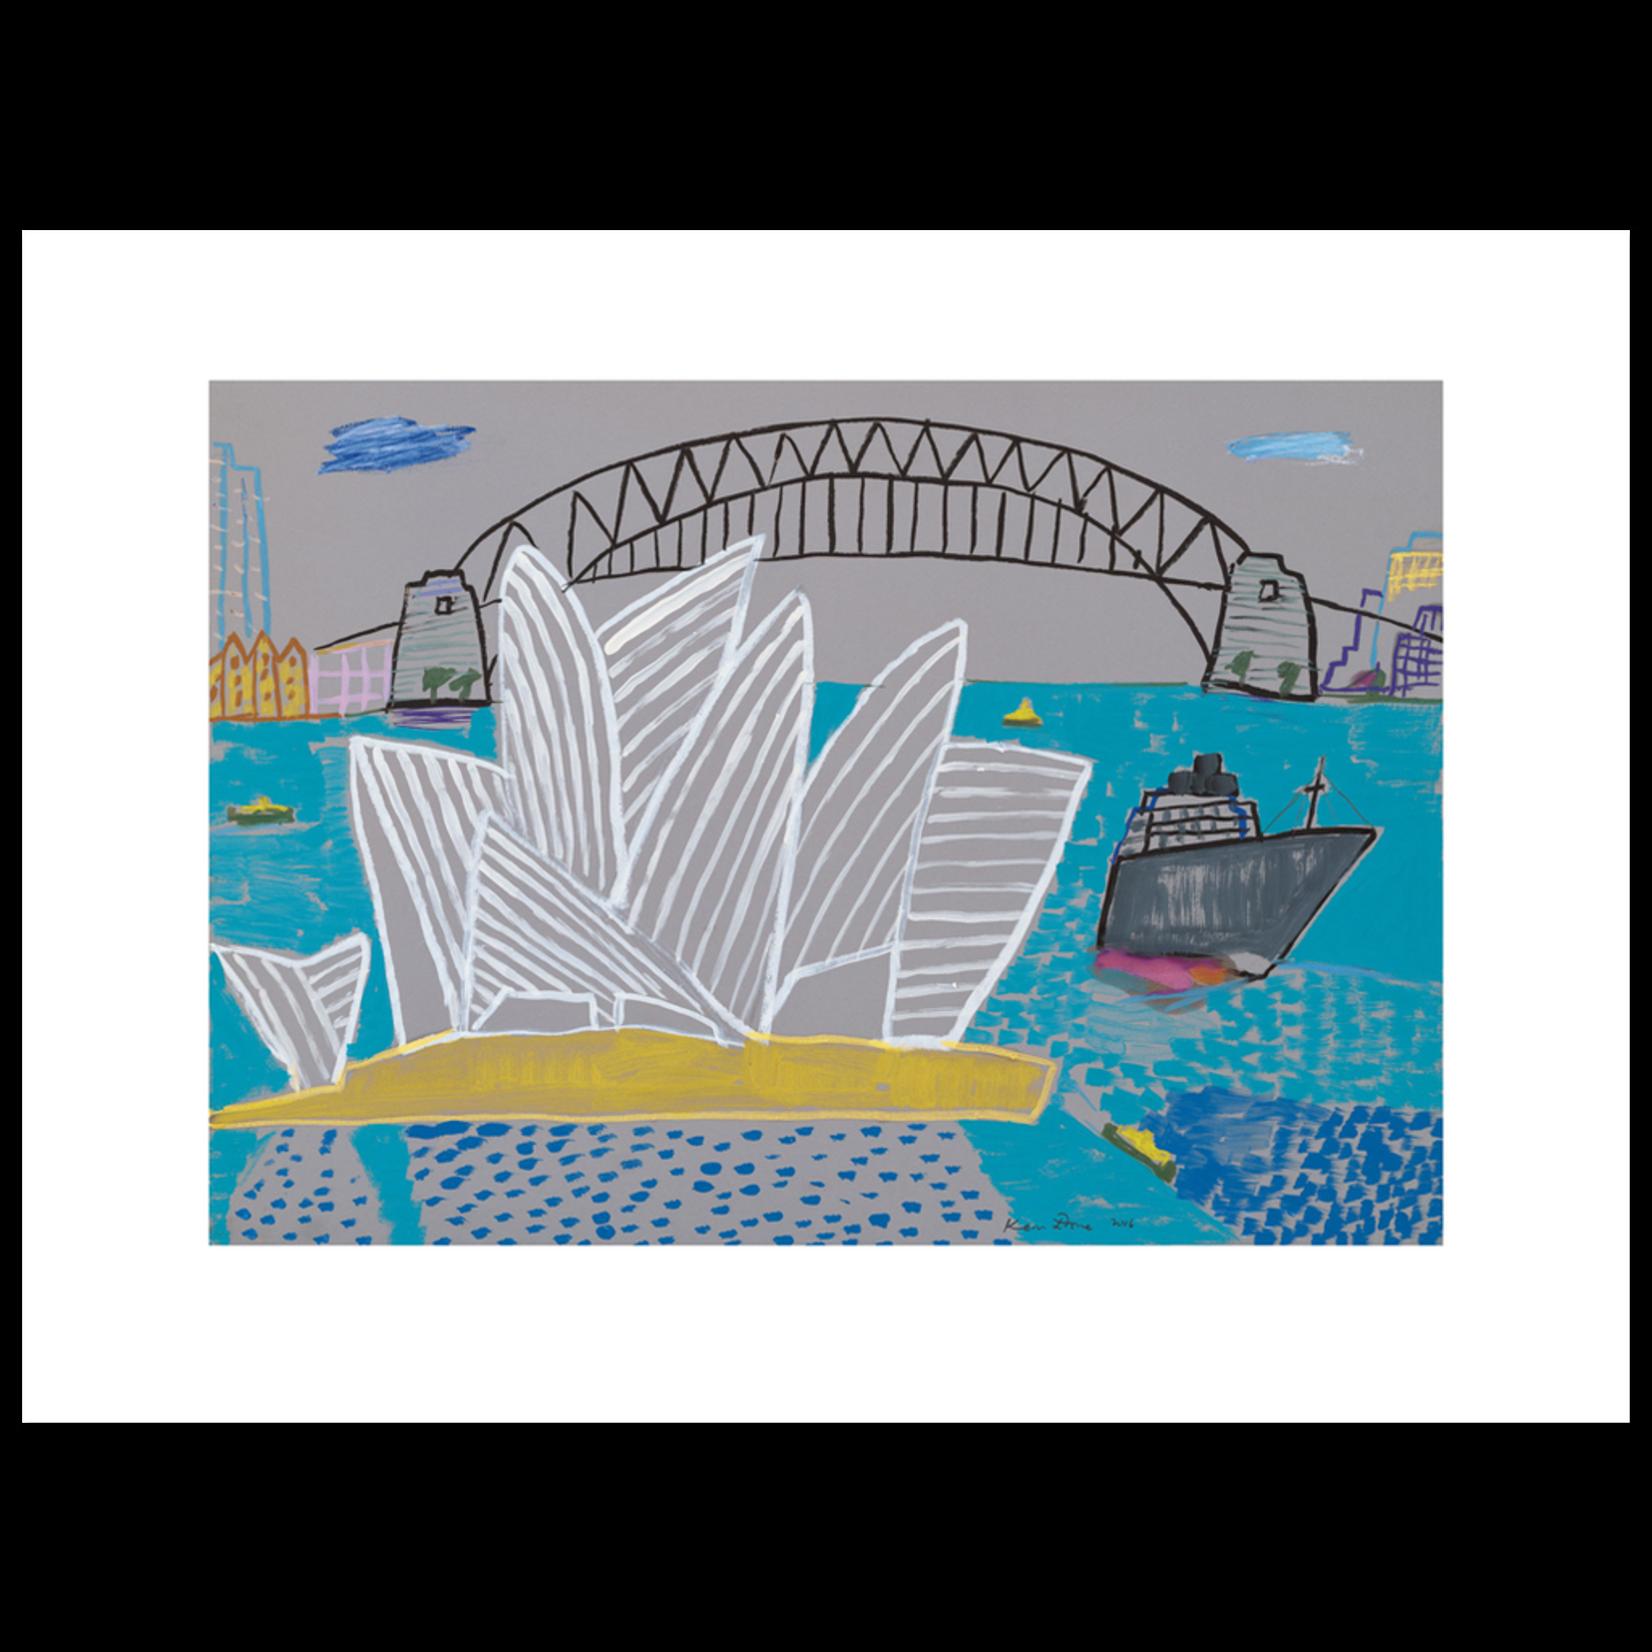 Limited Edition Prints Sydney Opera House, grey ship, 2006